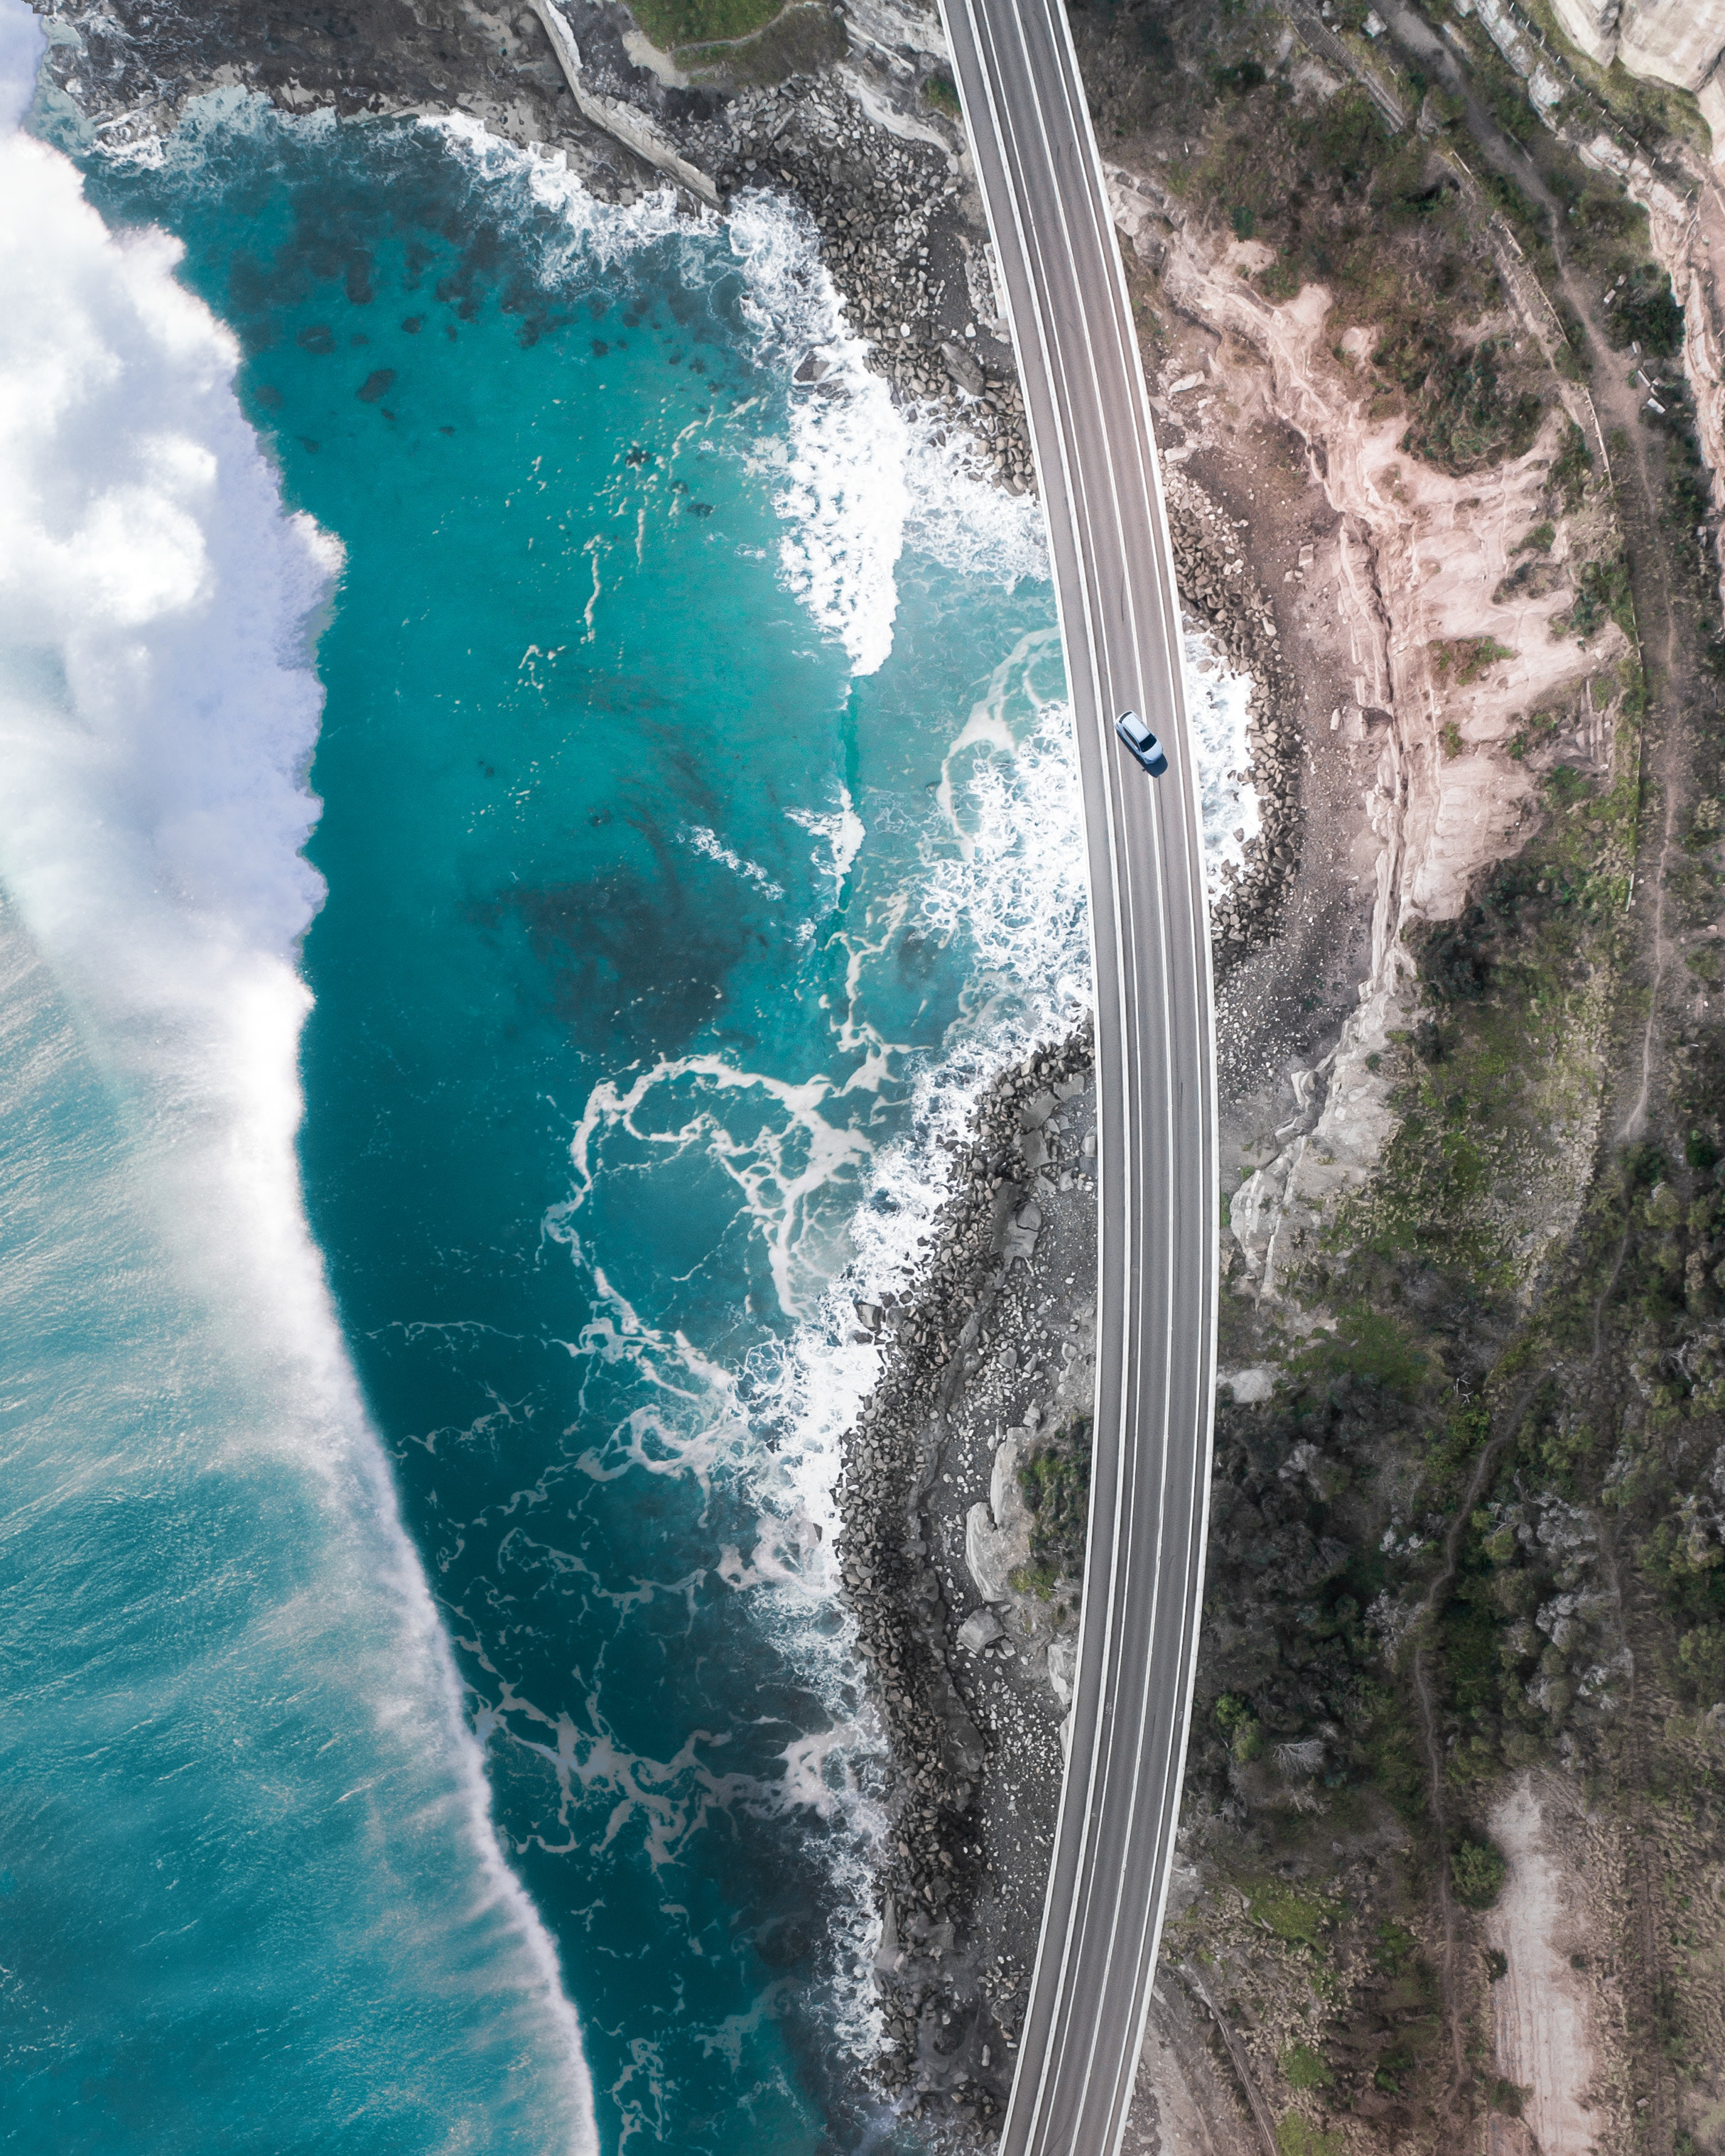 Austalia Lord How Luxury Island   Travel Guide   Elle Blonde Luxury Lifestyle Destination Blog